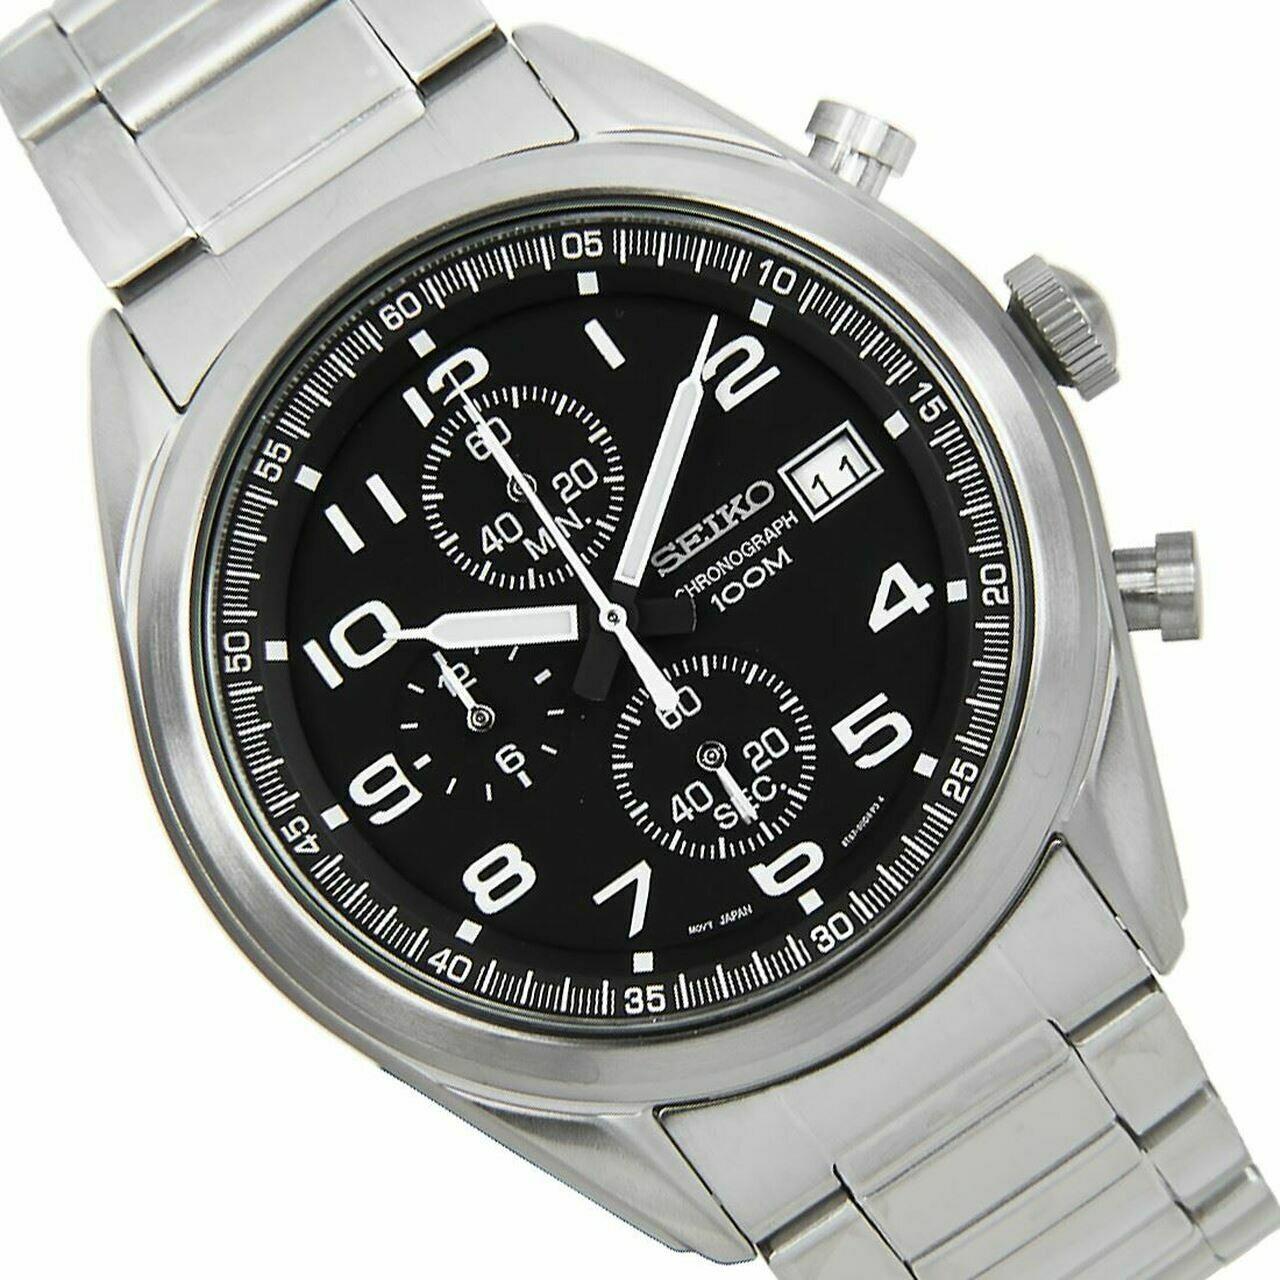 Reloj hombre Seiko Neosports SSB269P1 Chrono dial negro 45mm correa acero 100m water resist